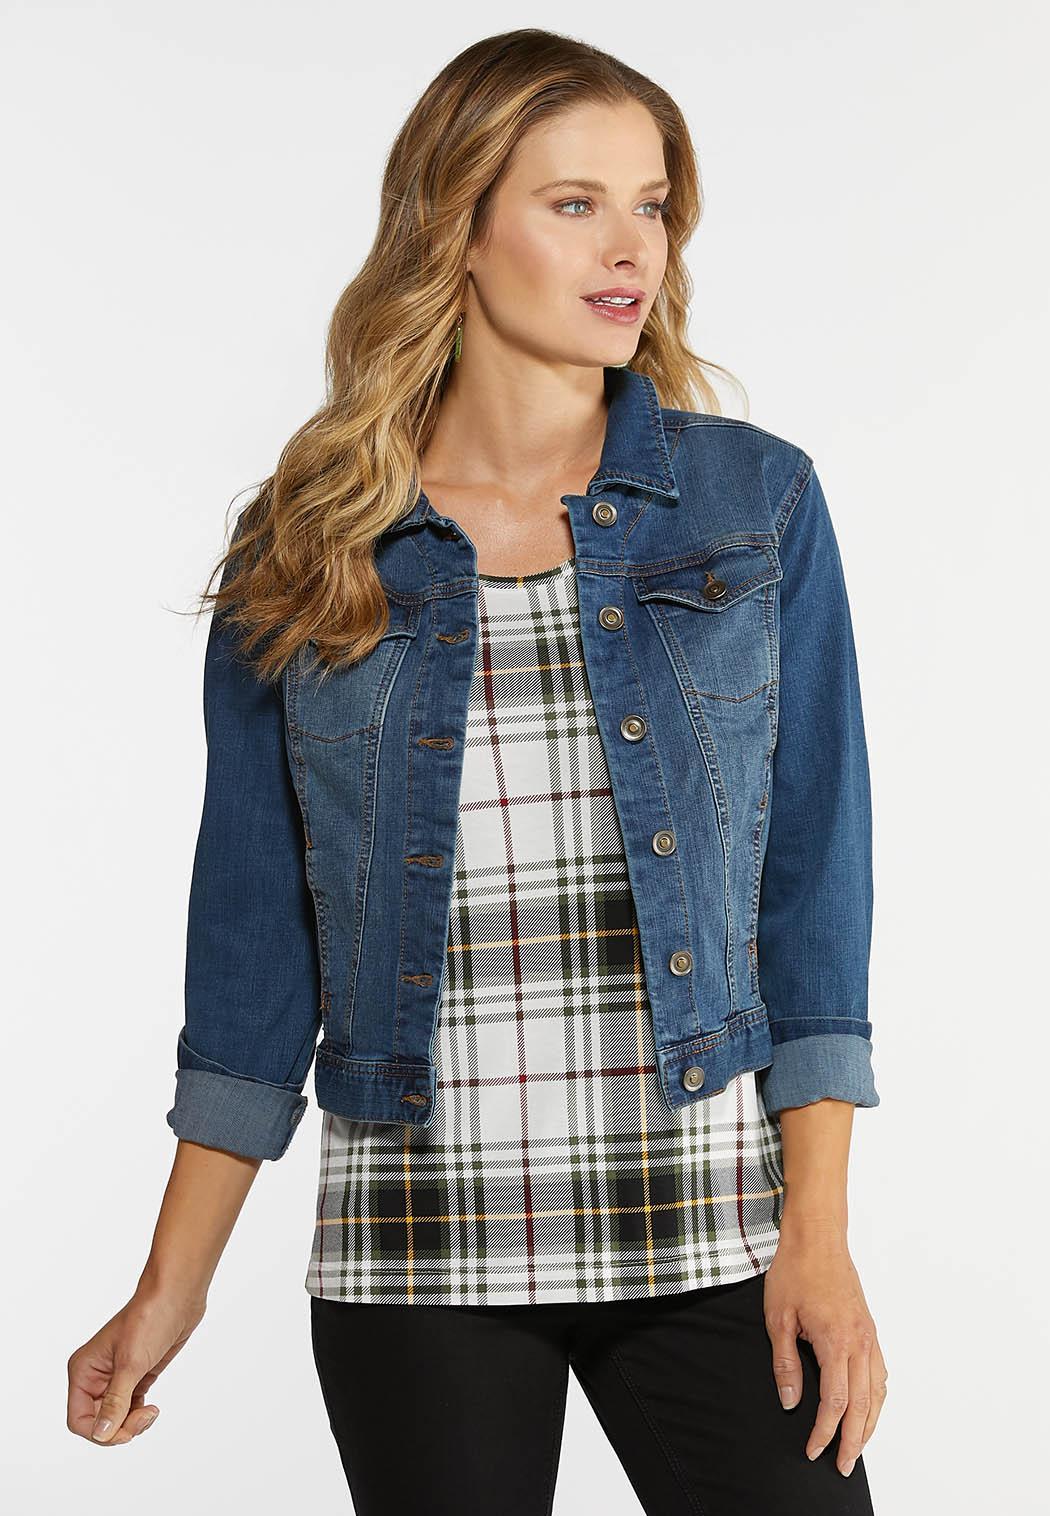 Essential Denim Jacket